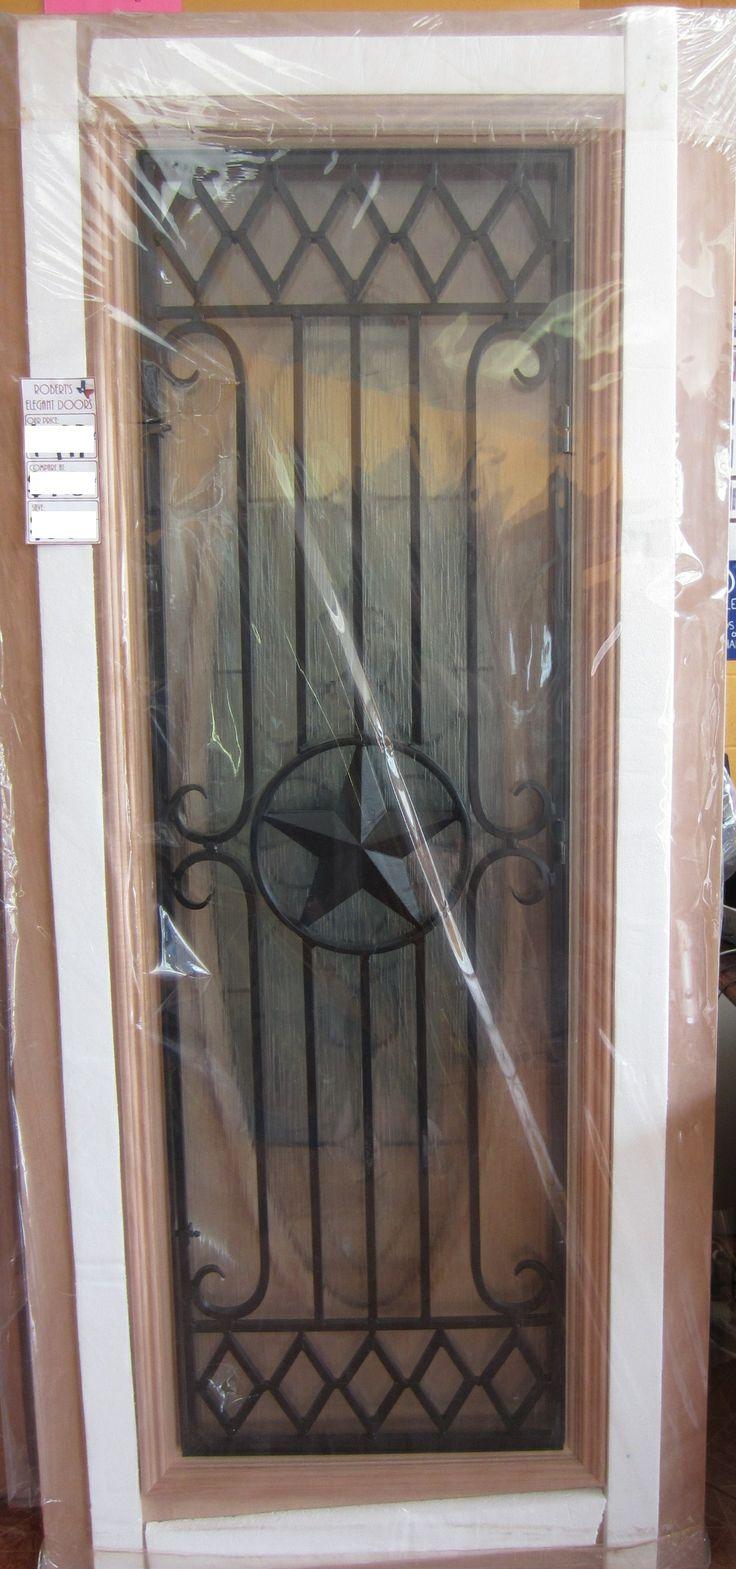 #10 FULL LITE IRON GRILL TEXAS STAR MAHOGANY WOOD DOOR